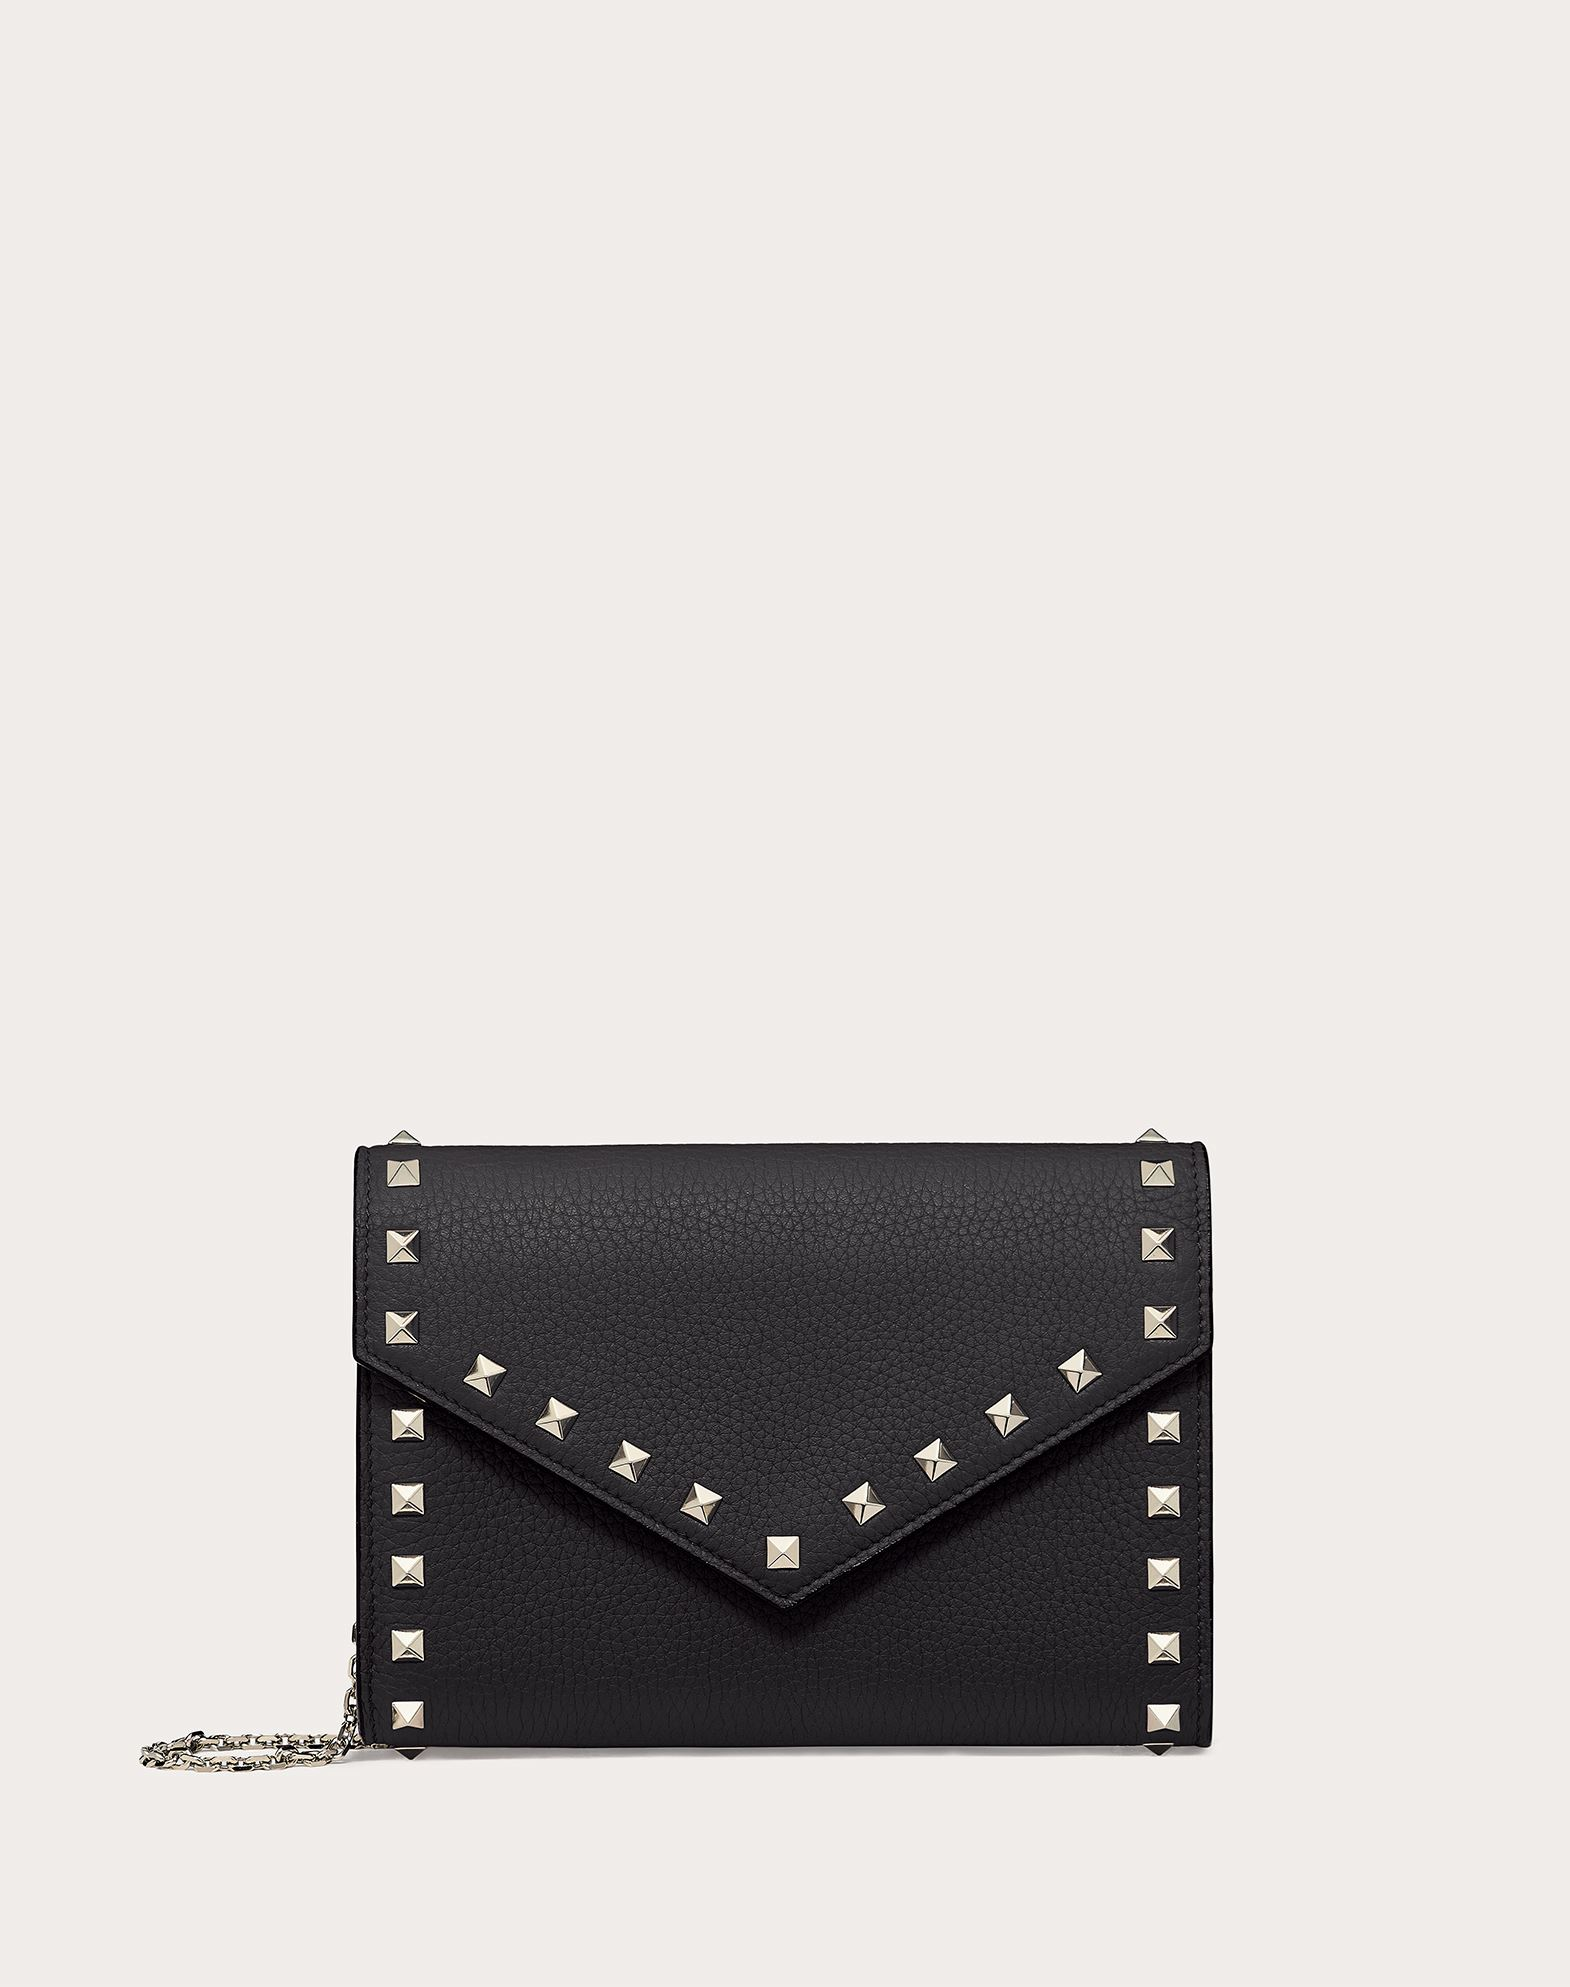 VALENTINO GARAVANI Rockstud Wallet with chain CHAIN WALLETS D f